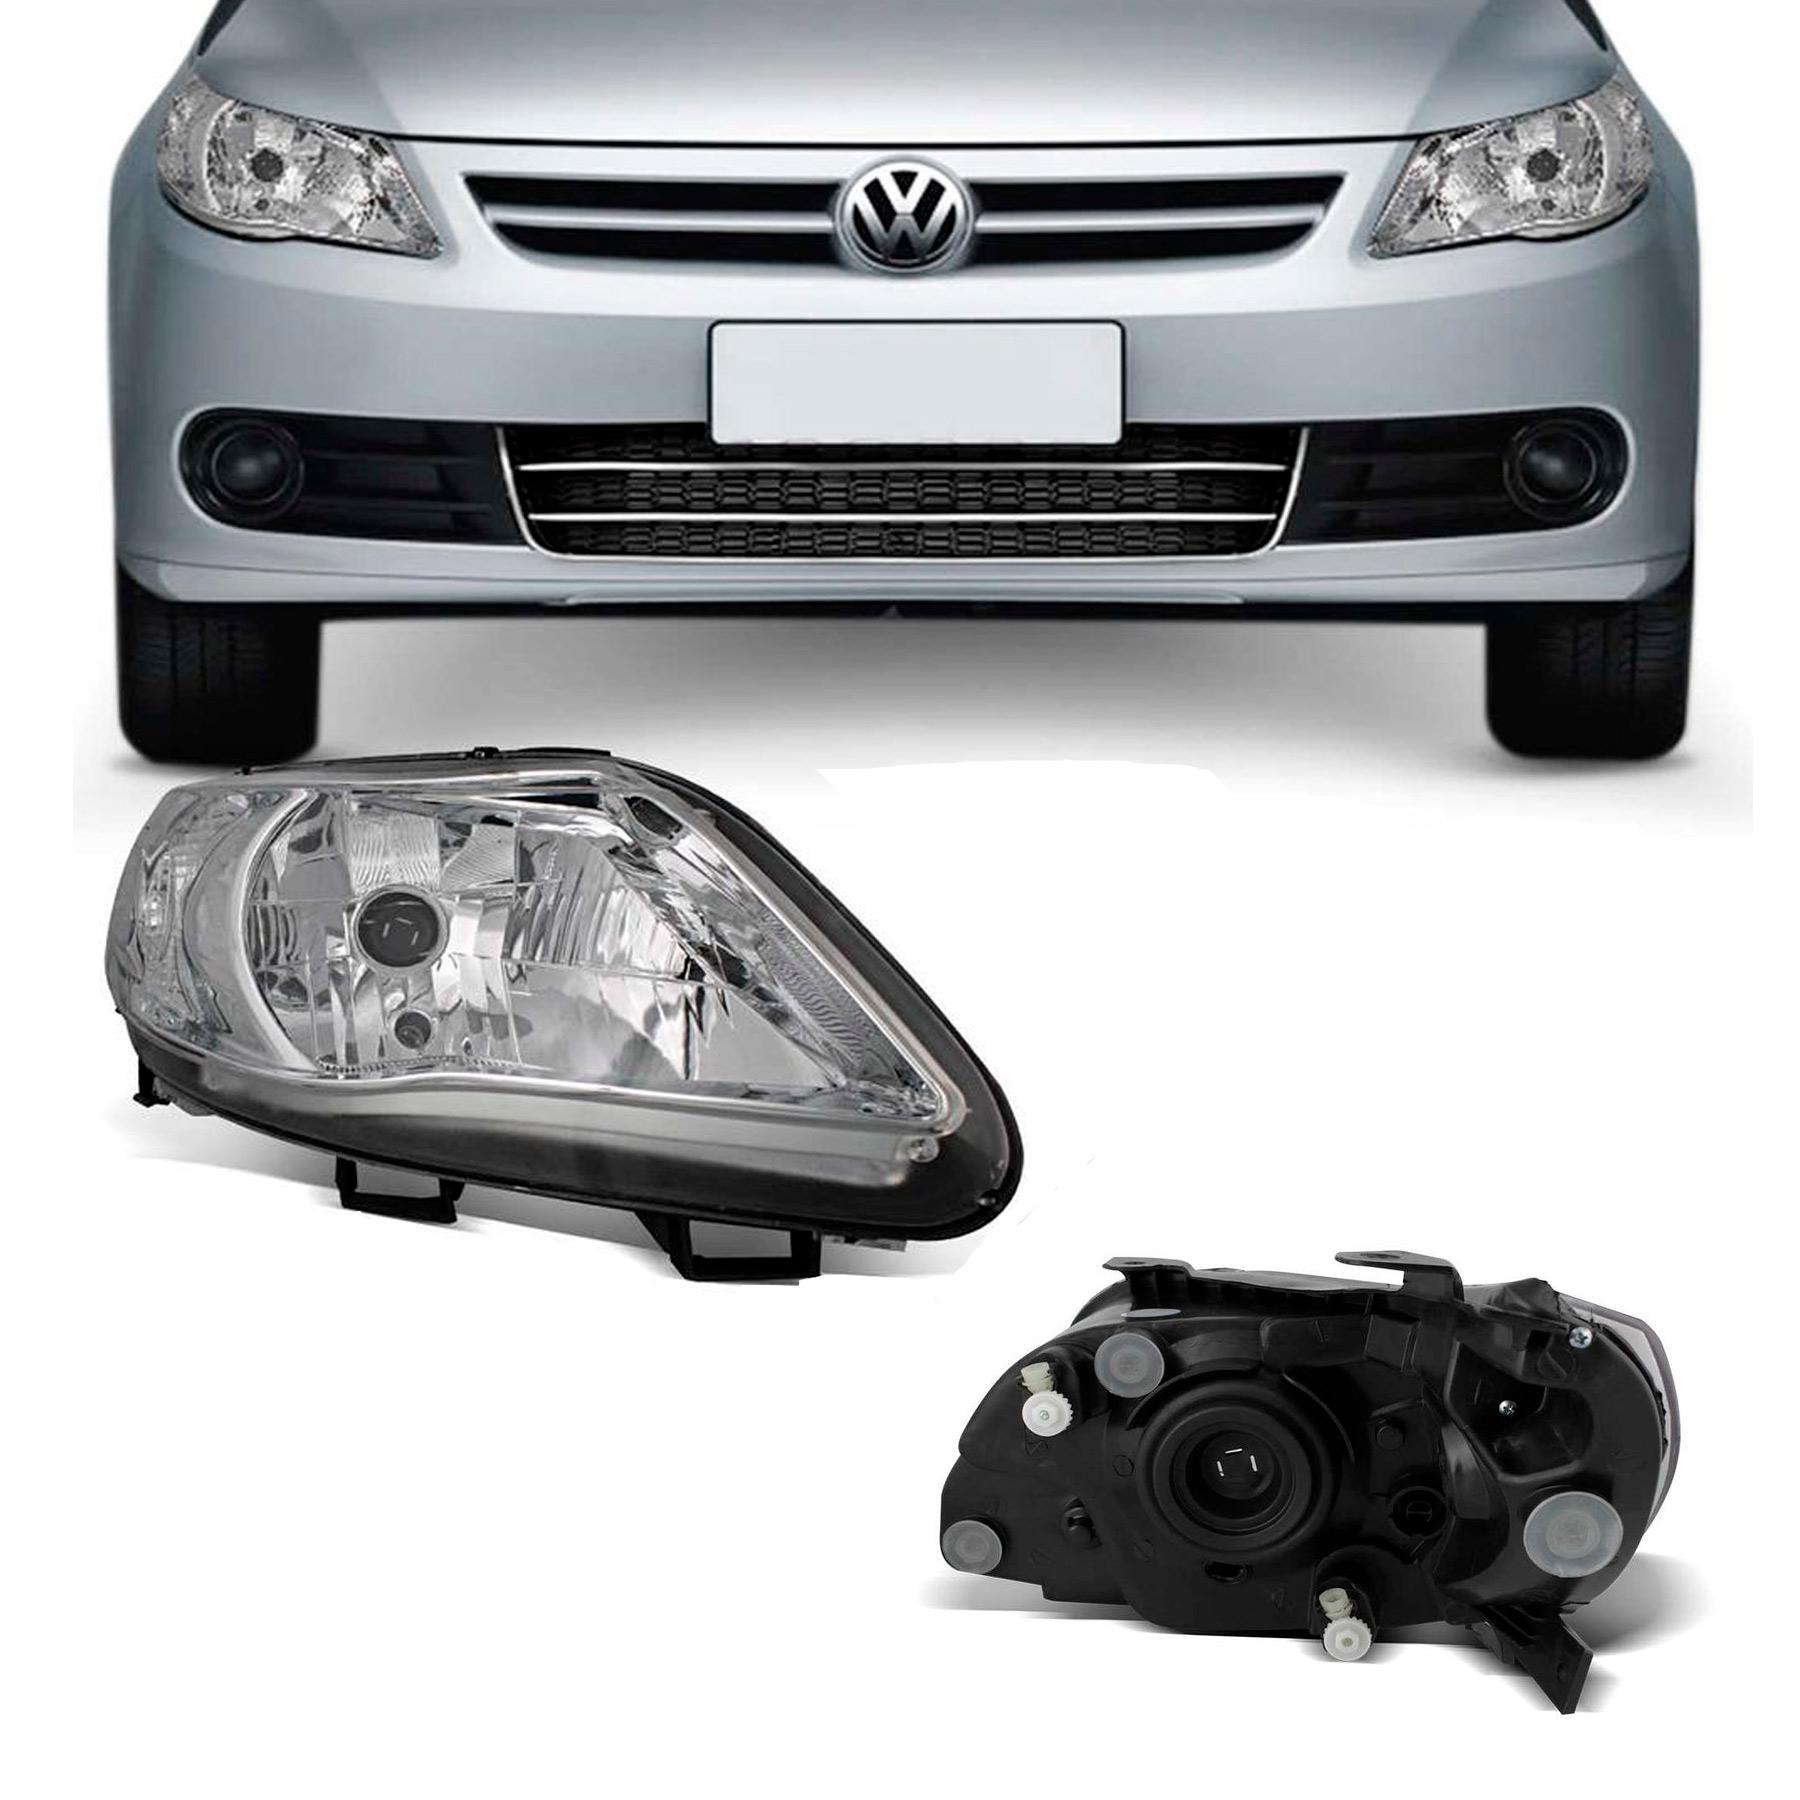 Farol Direito Volkswagen Gol Voyage G5 2009 a 2012 Saveiro G5 2009 a 2013 Foco Simples